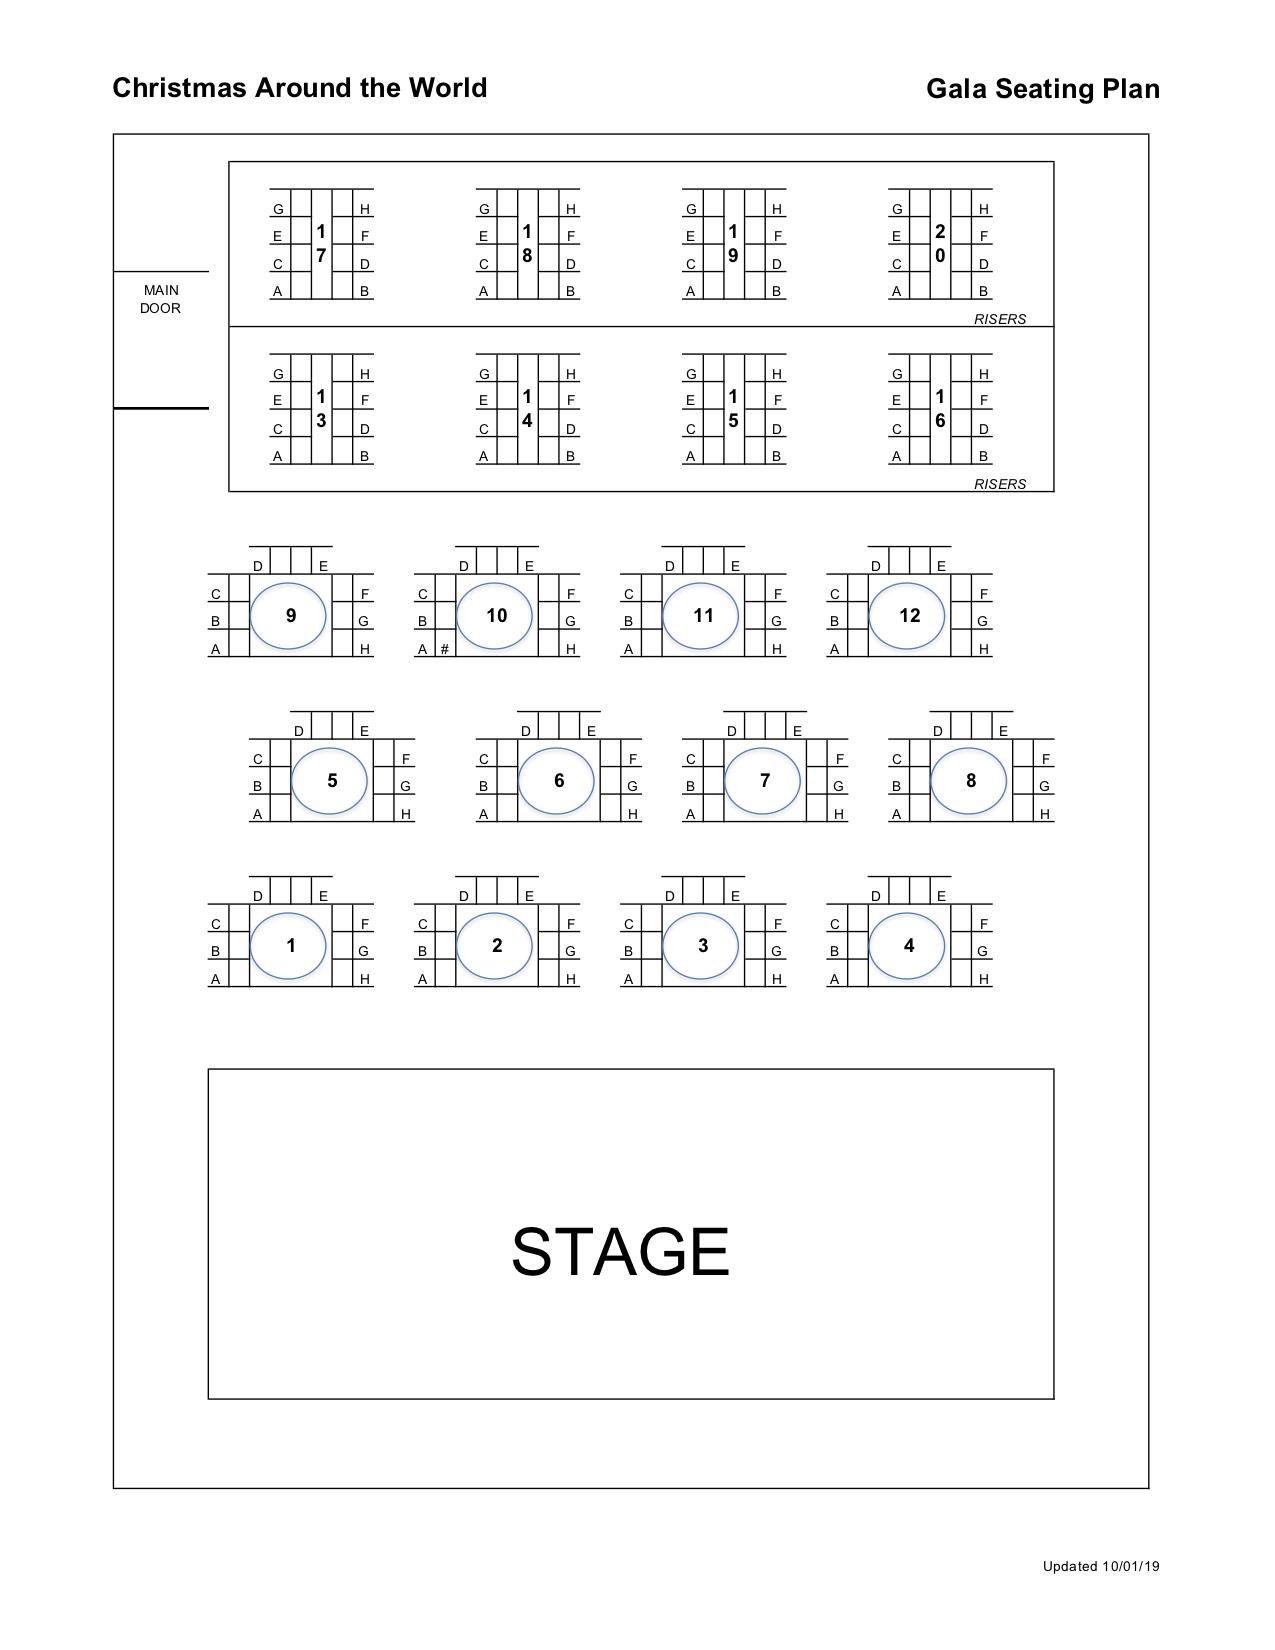 Gala Seating Chart png.png